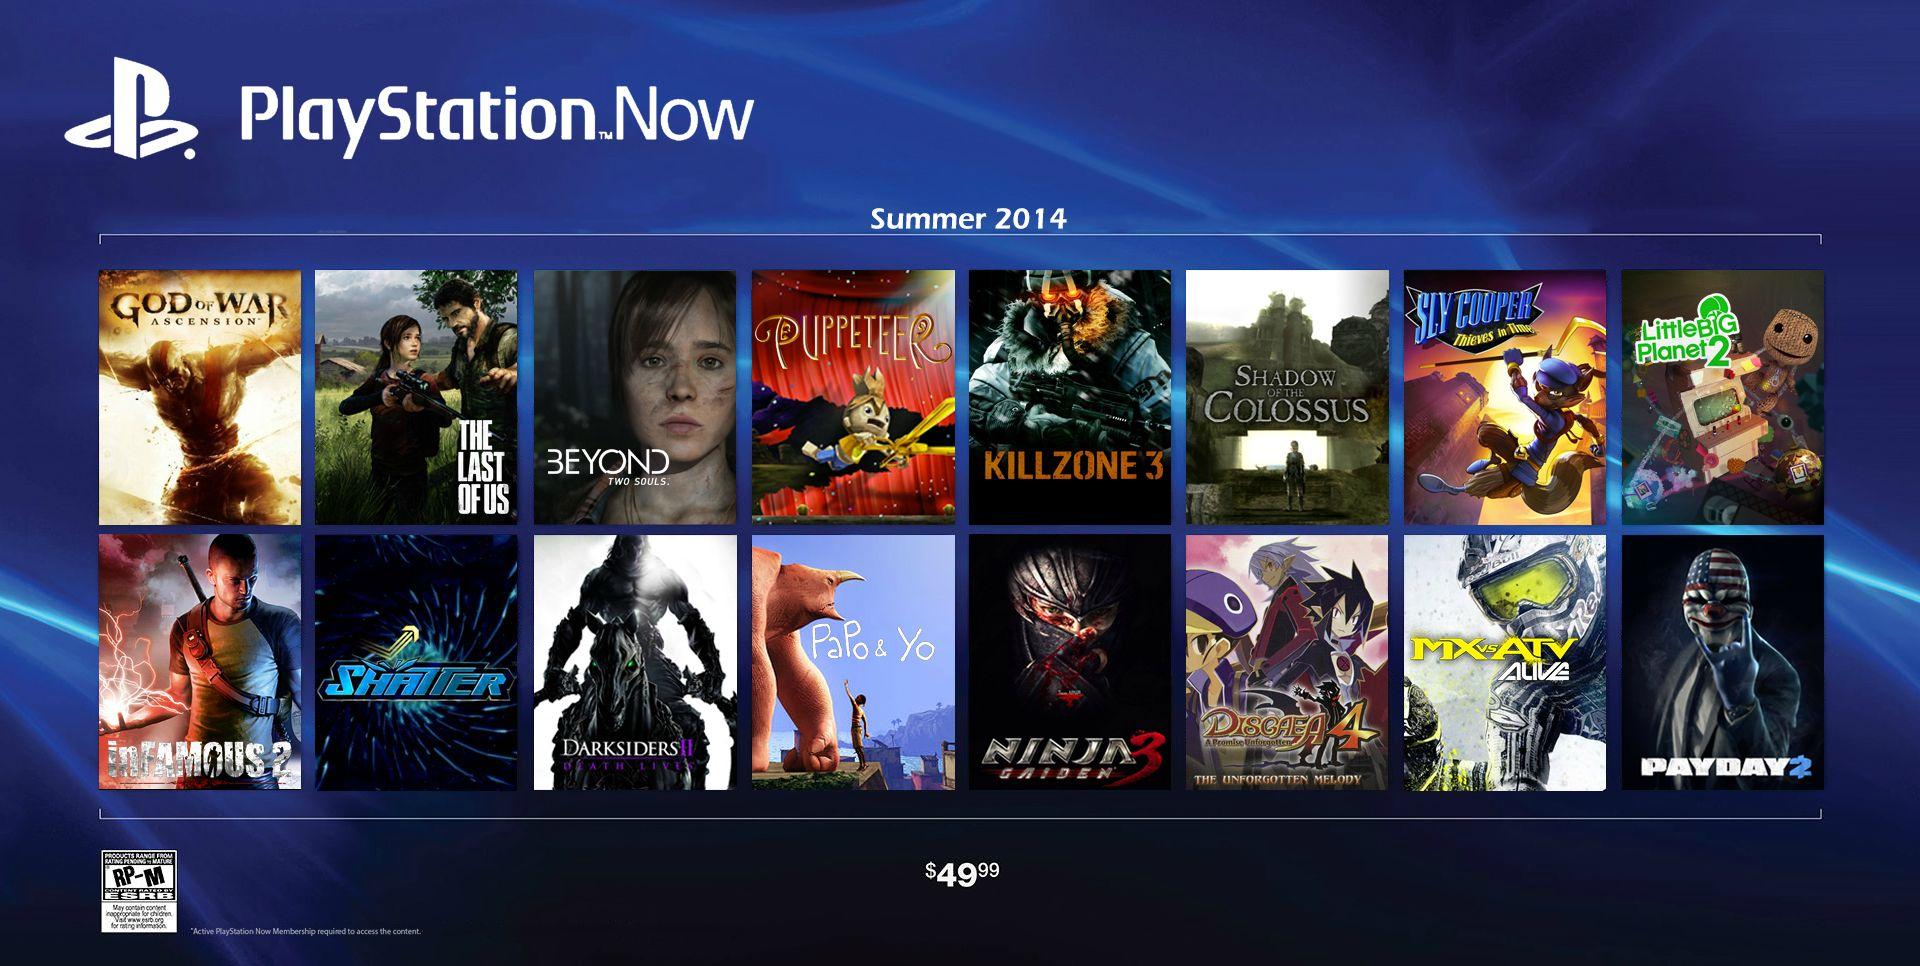 Playstation Now 2014 - Playstation Now: Reddit svela i titoli di lancio, ma sorge qualche dubbio